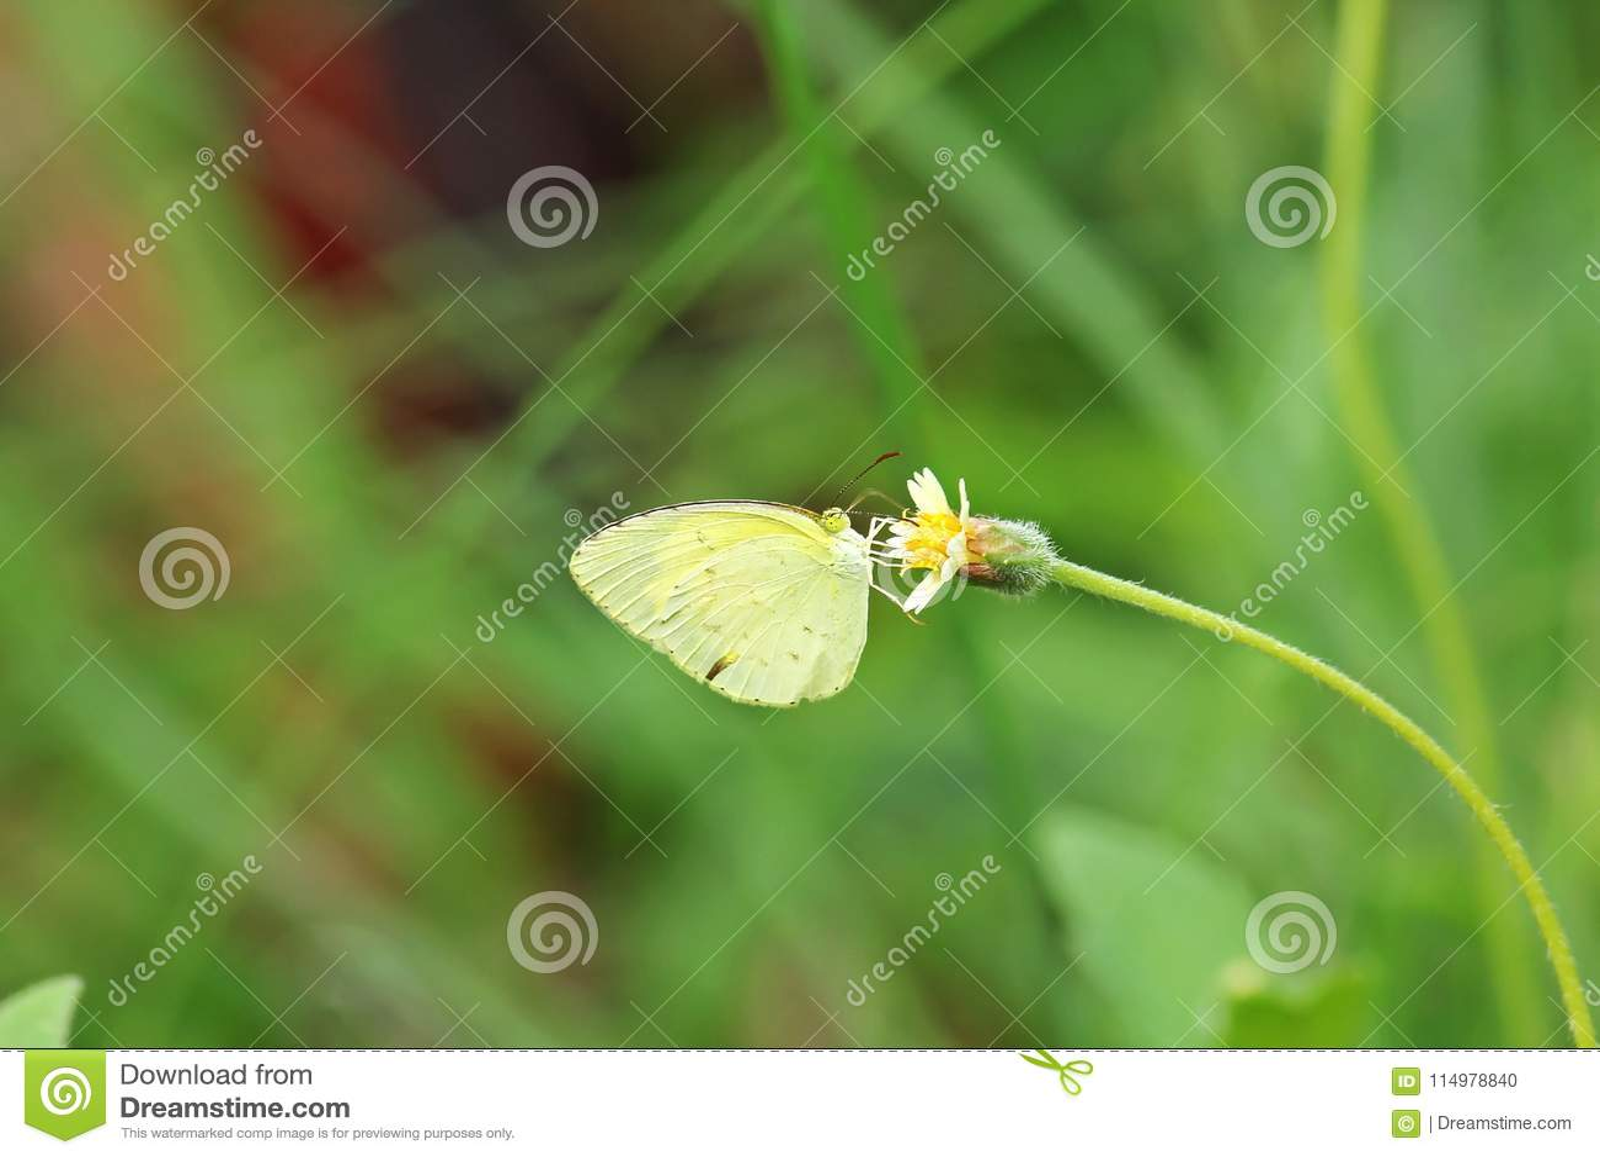 Общая бабочка желтого цвета травы на желтом цветке